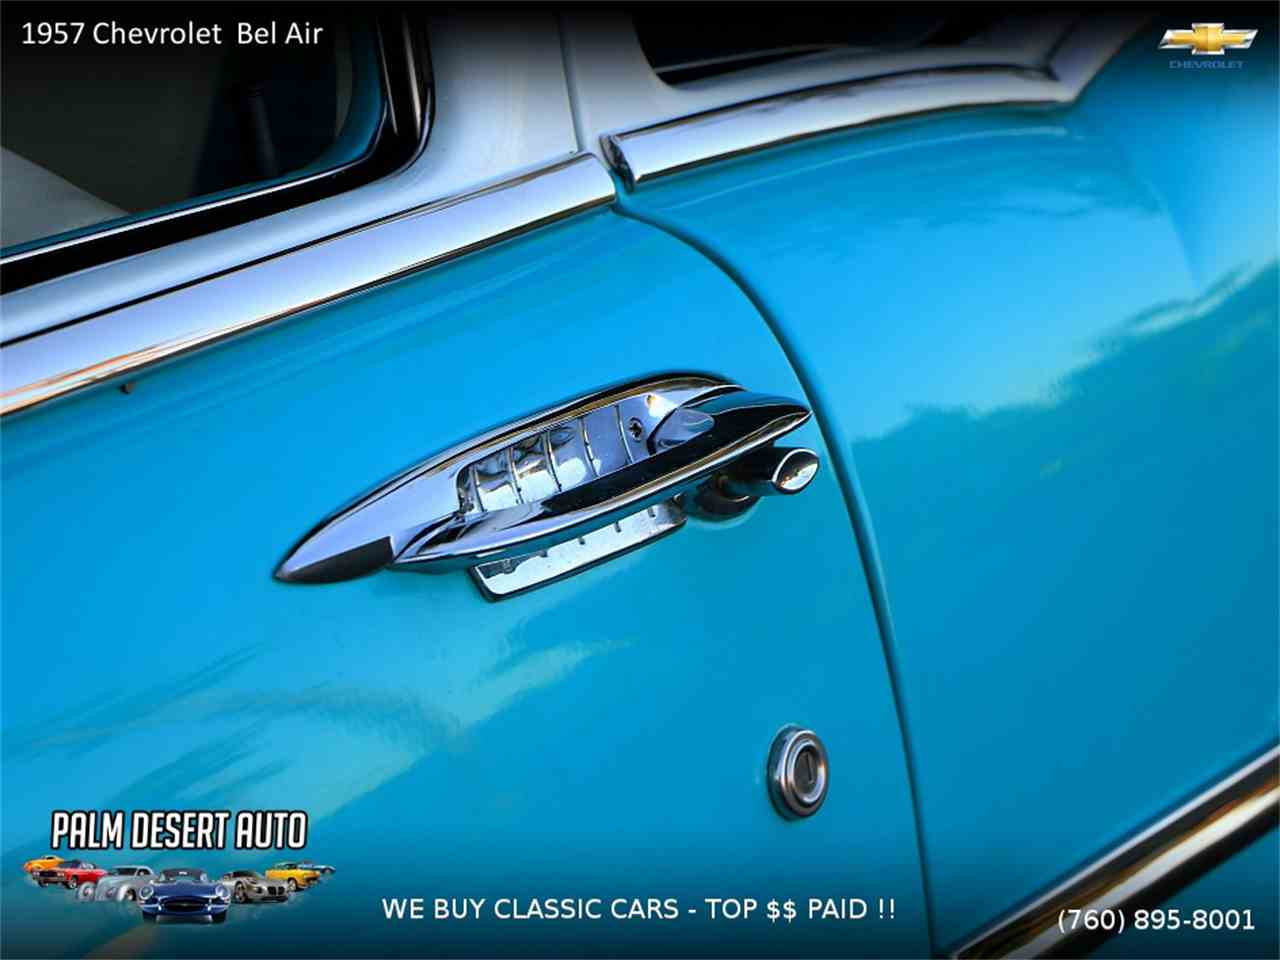 1957 Chevrolet Bel Air for Sale | ClassicCars.com | CC-1058219